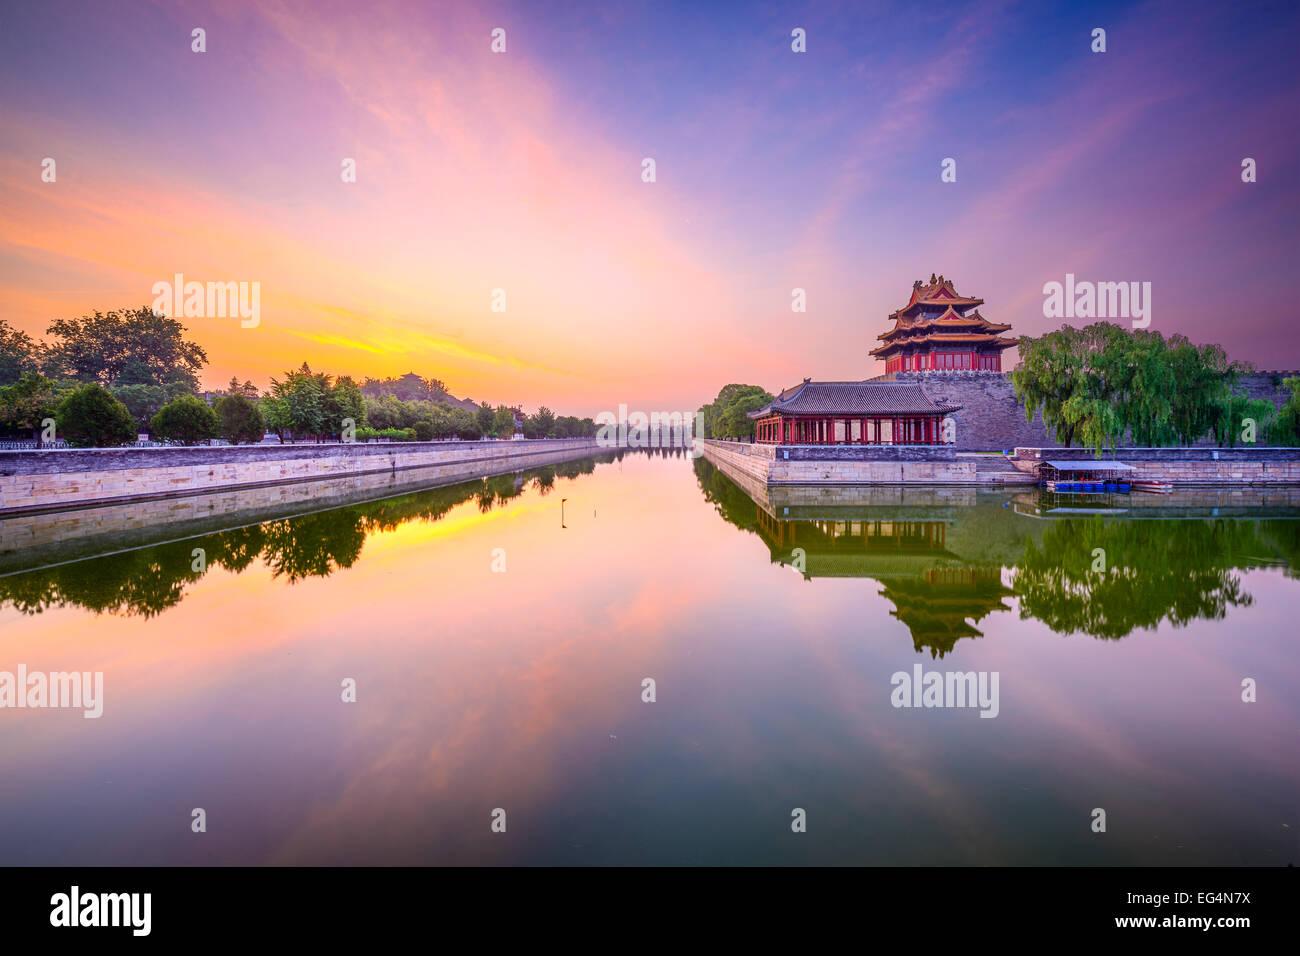 Peking, Verbotene Stadt äußeren Graben im Morgengrauen. Stockbild